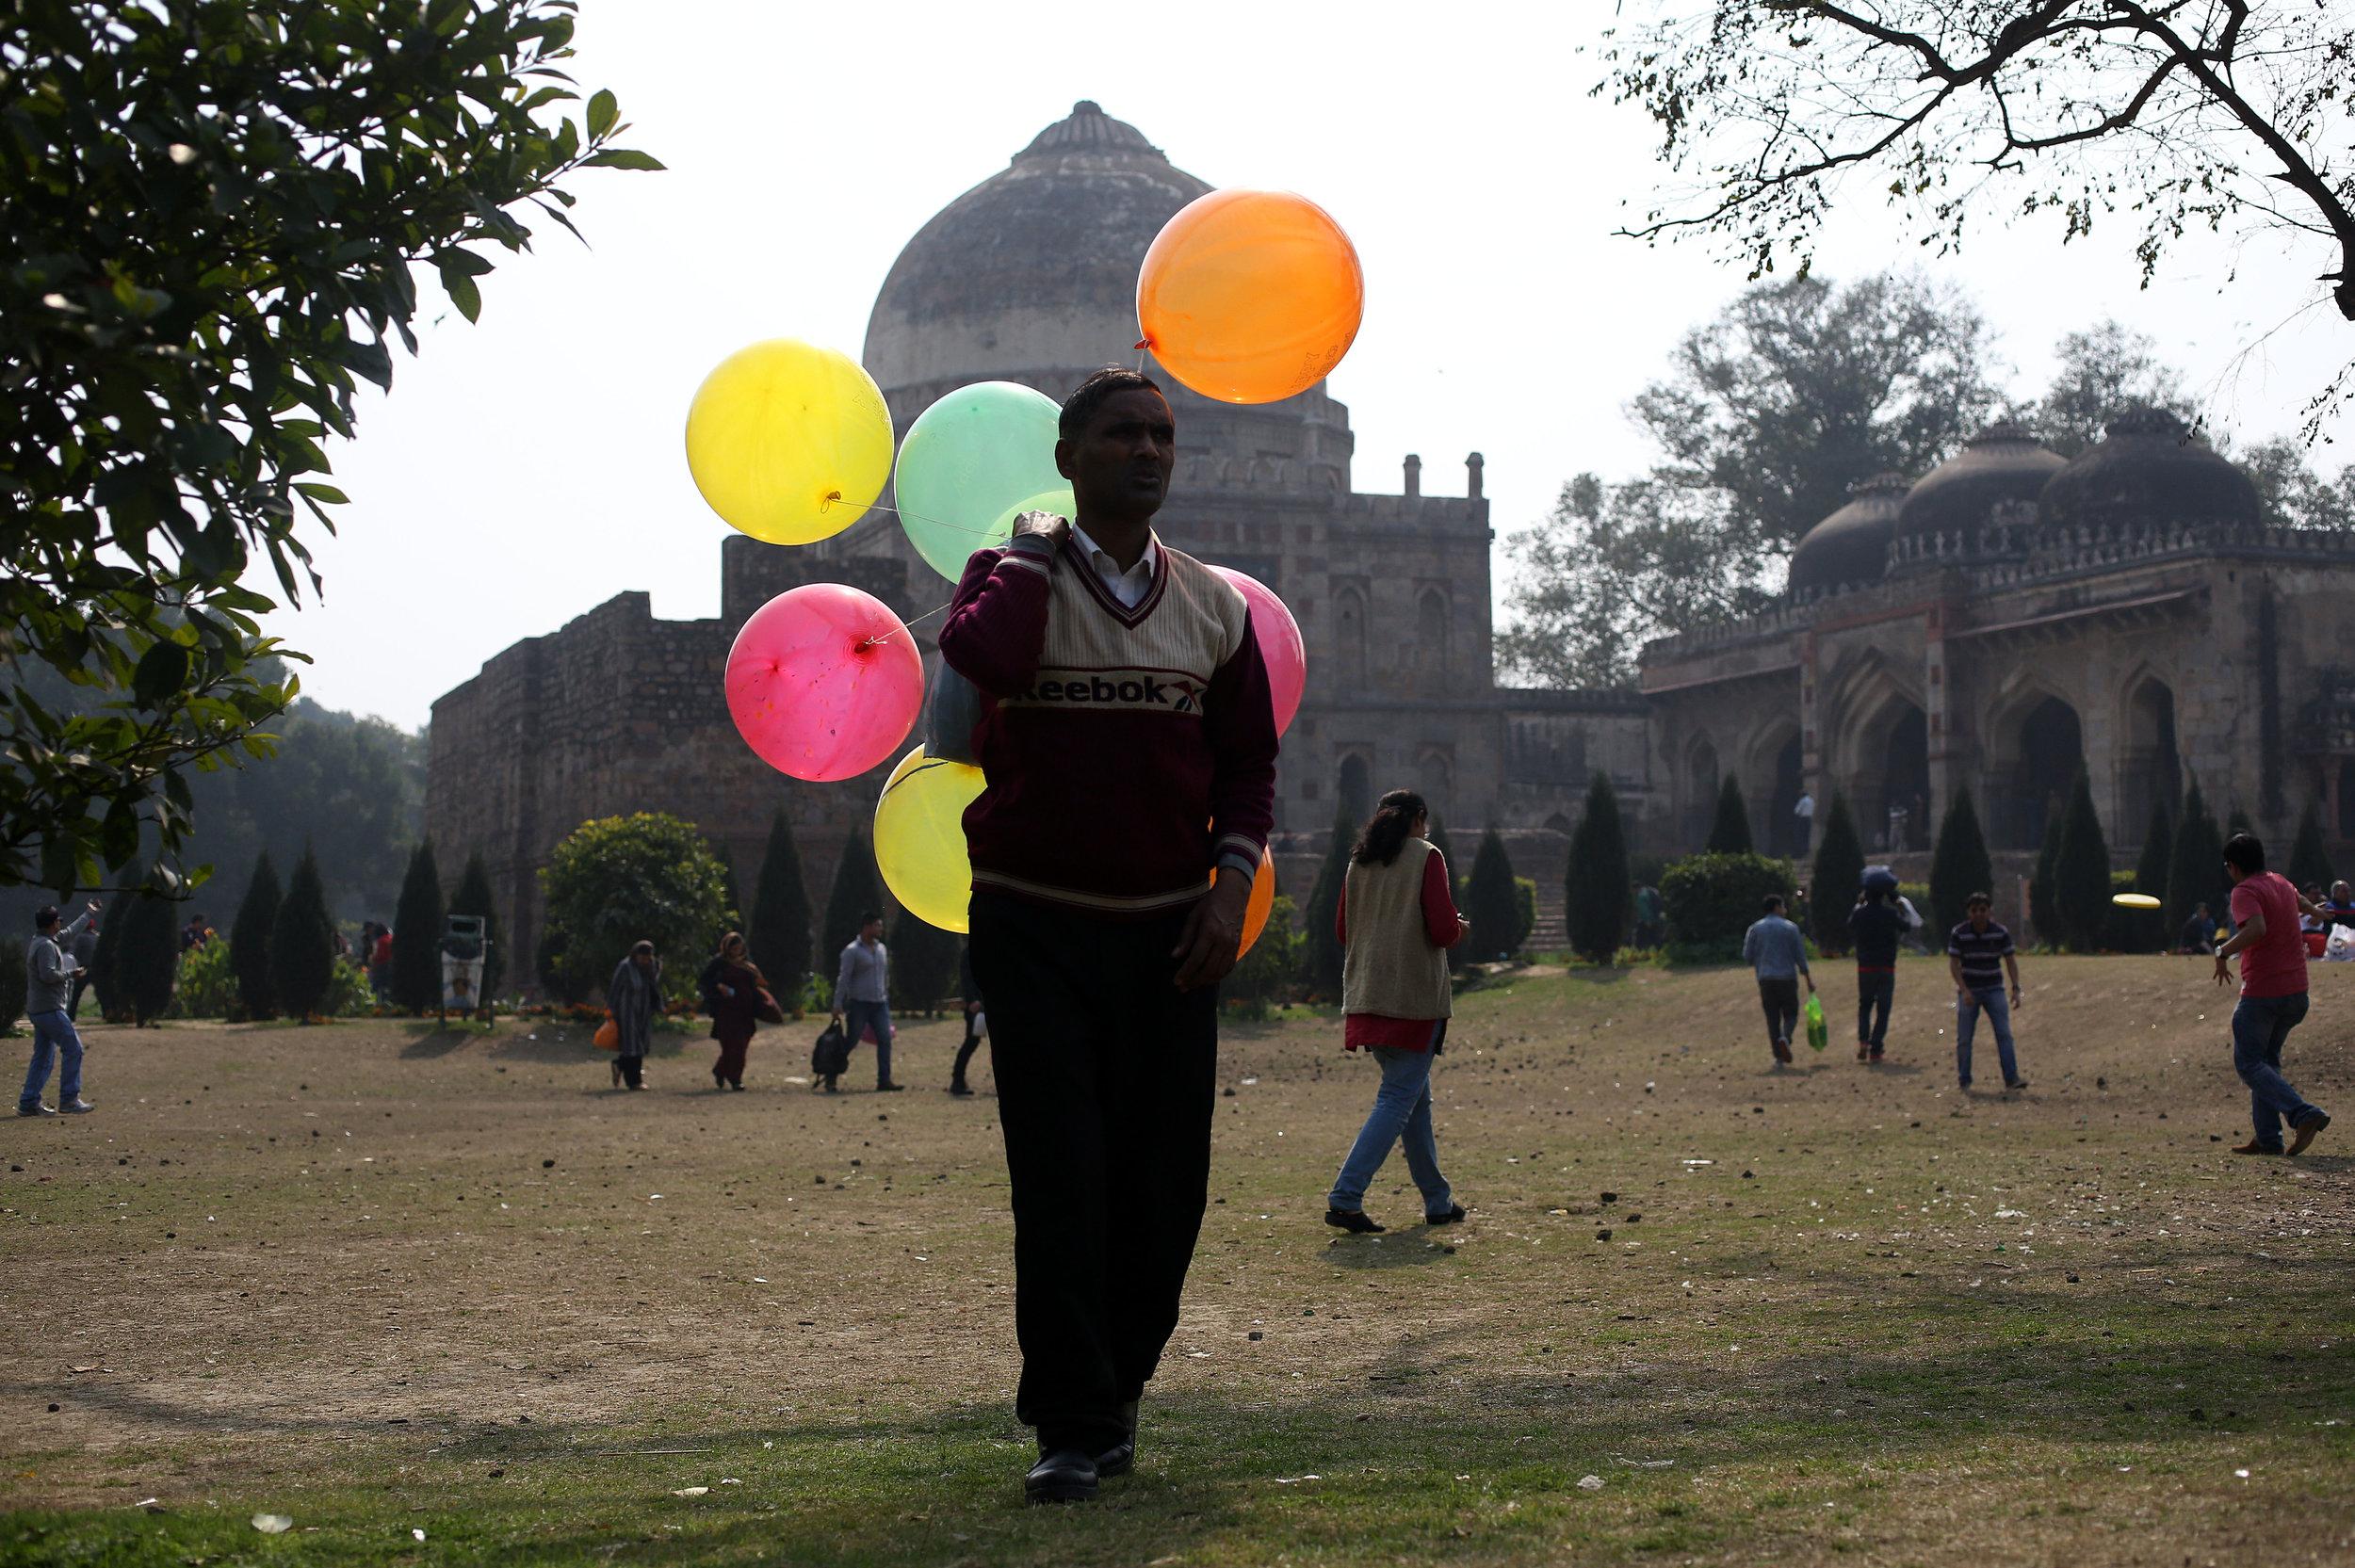 A balloon seller is pictured walking through Lodhi Gardens in New Delhi.